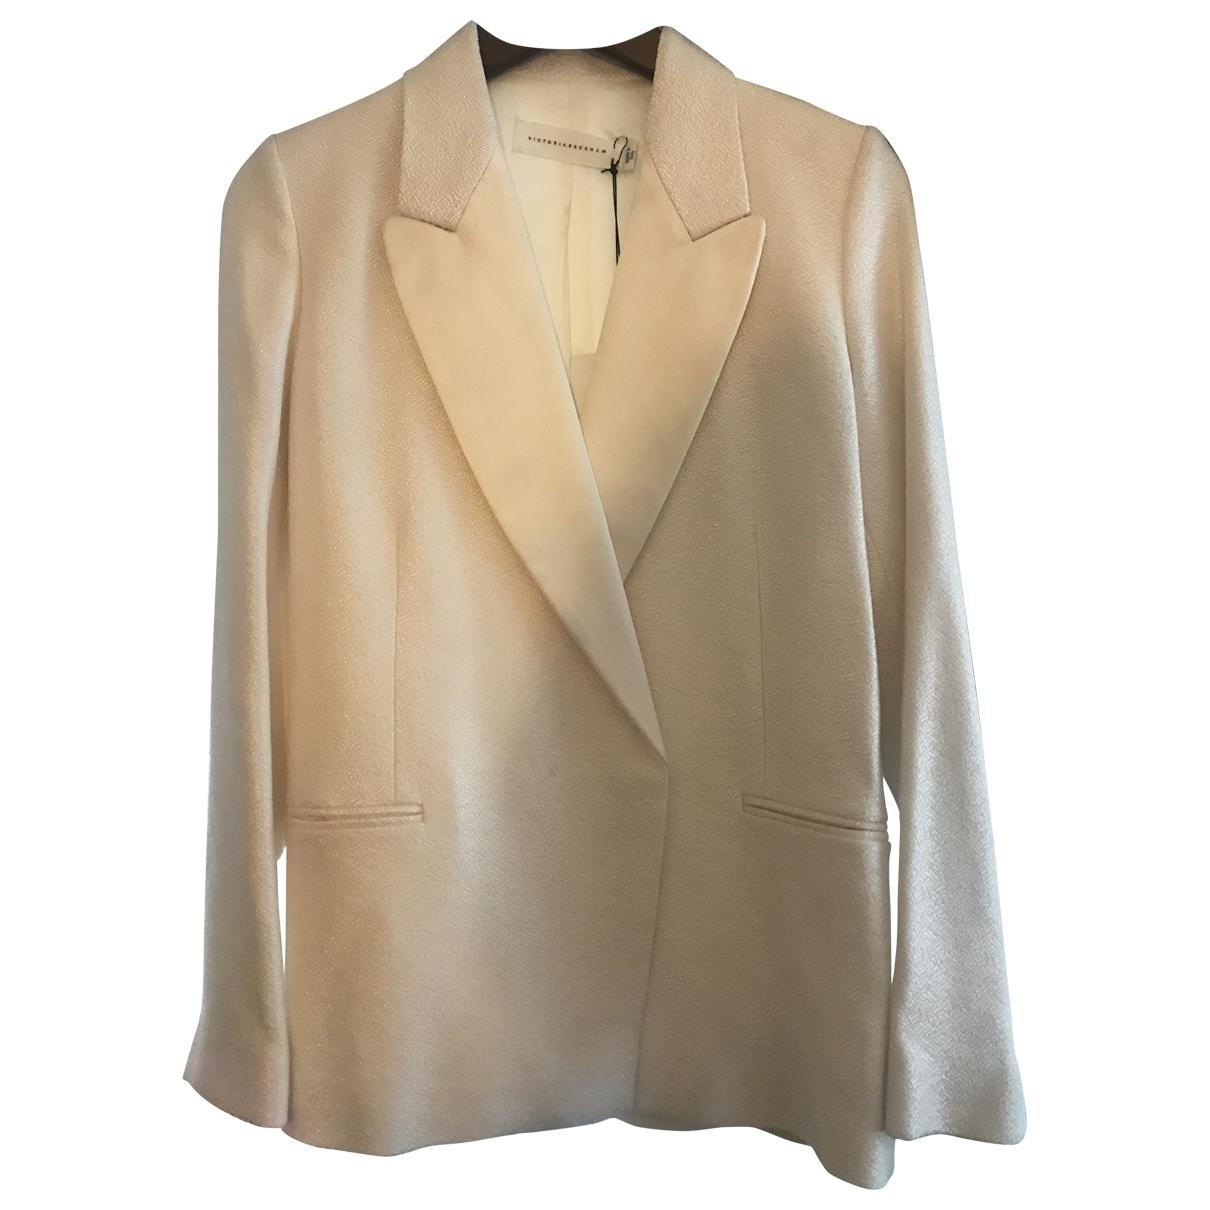 Victoria Beckham \N White Wool jacket for Women 10 UK